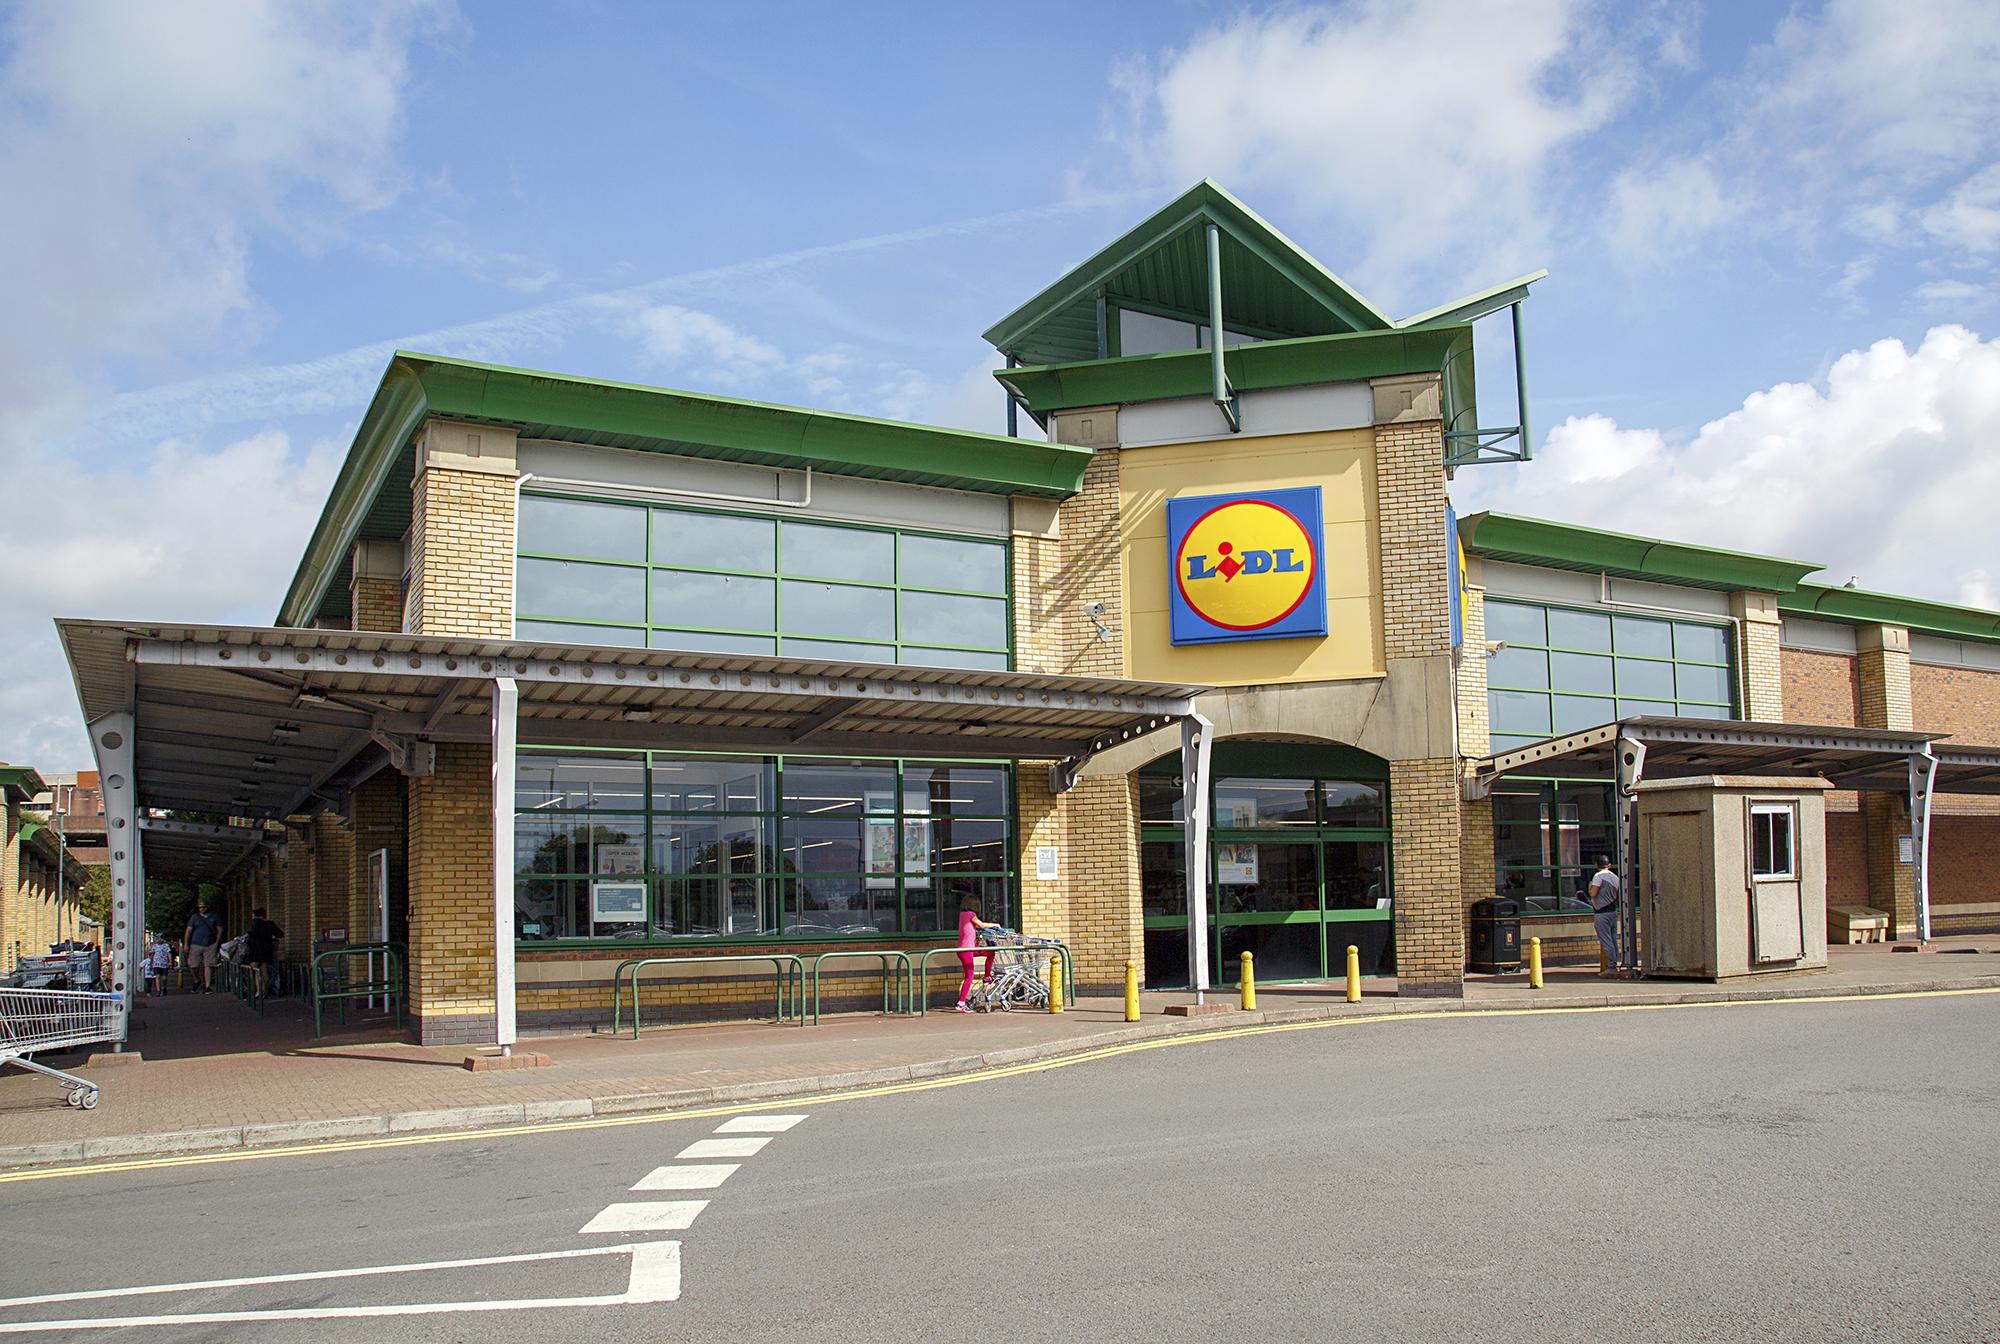 Lidl supermarket. (Image: jax10289/Shutterstock)